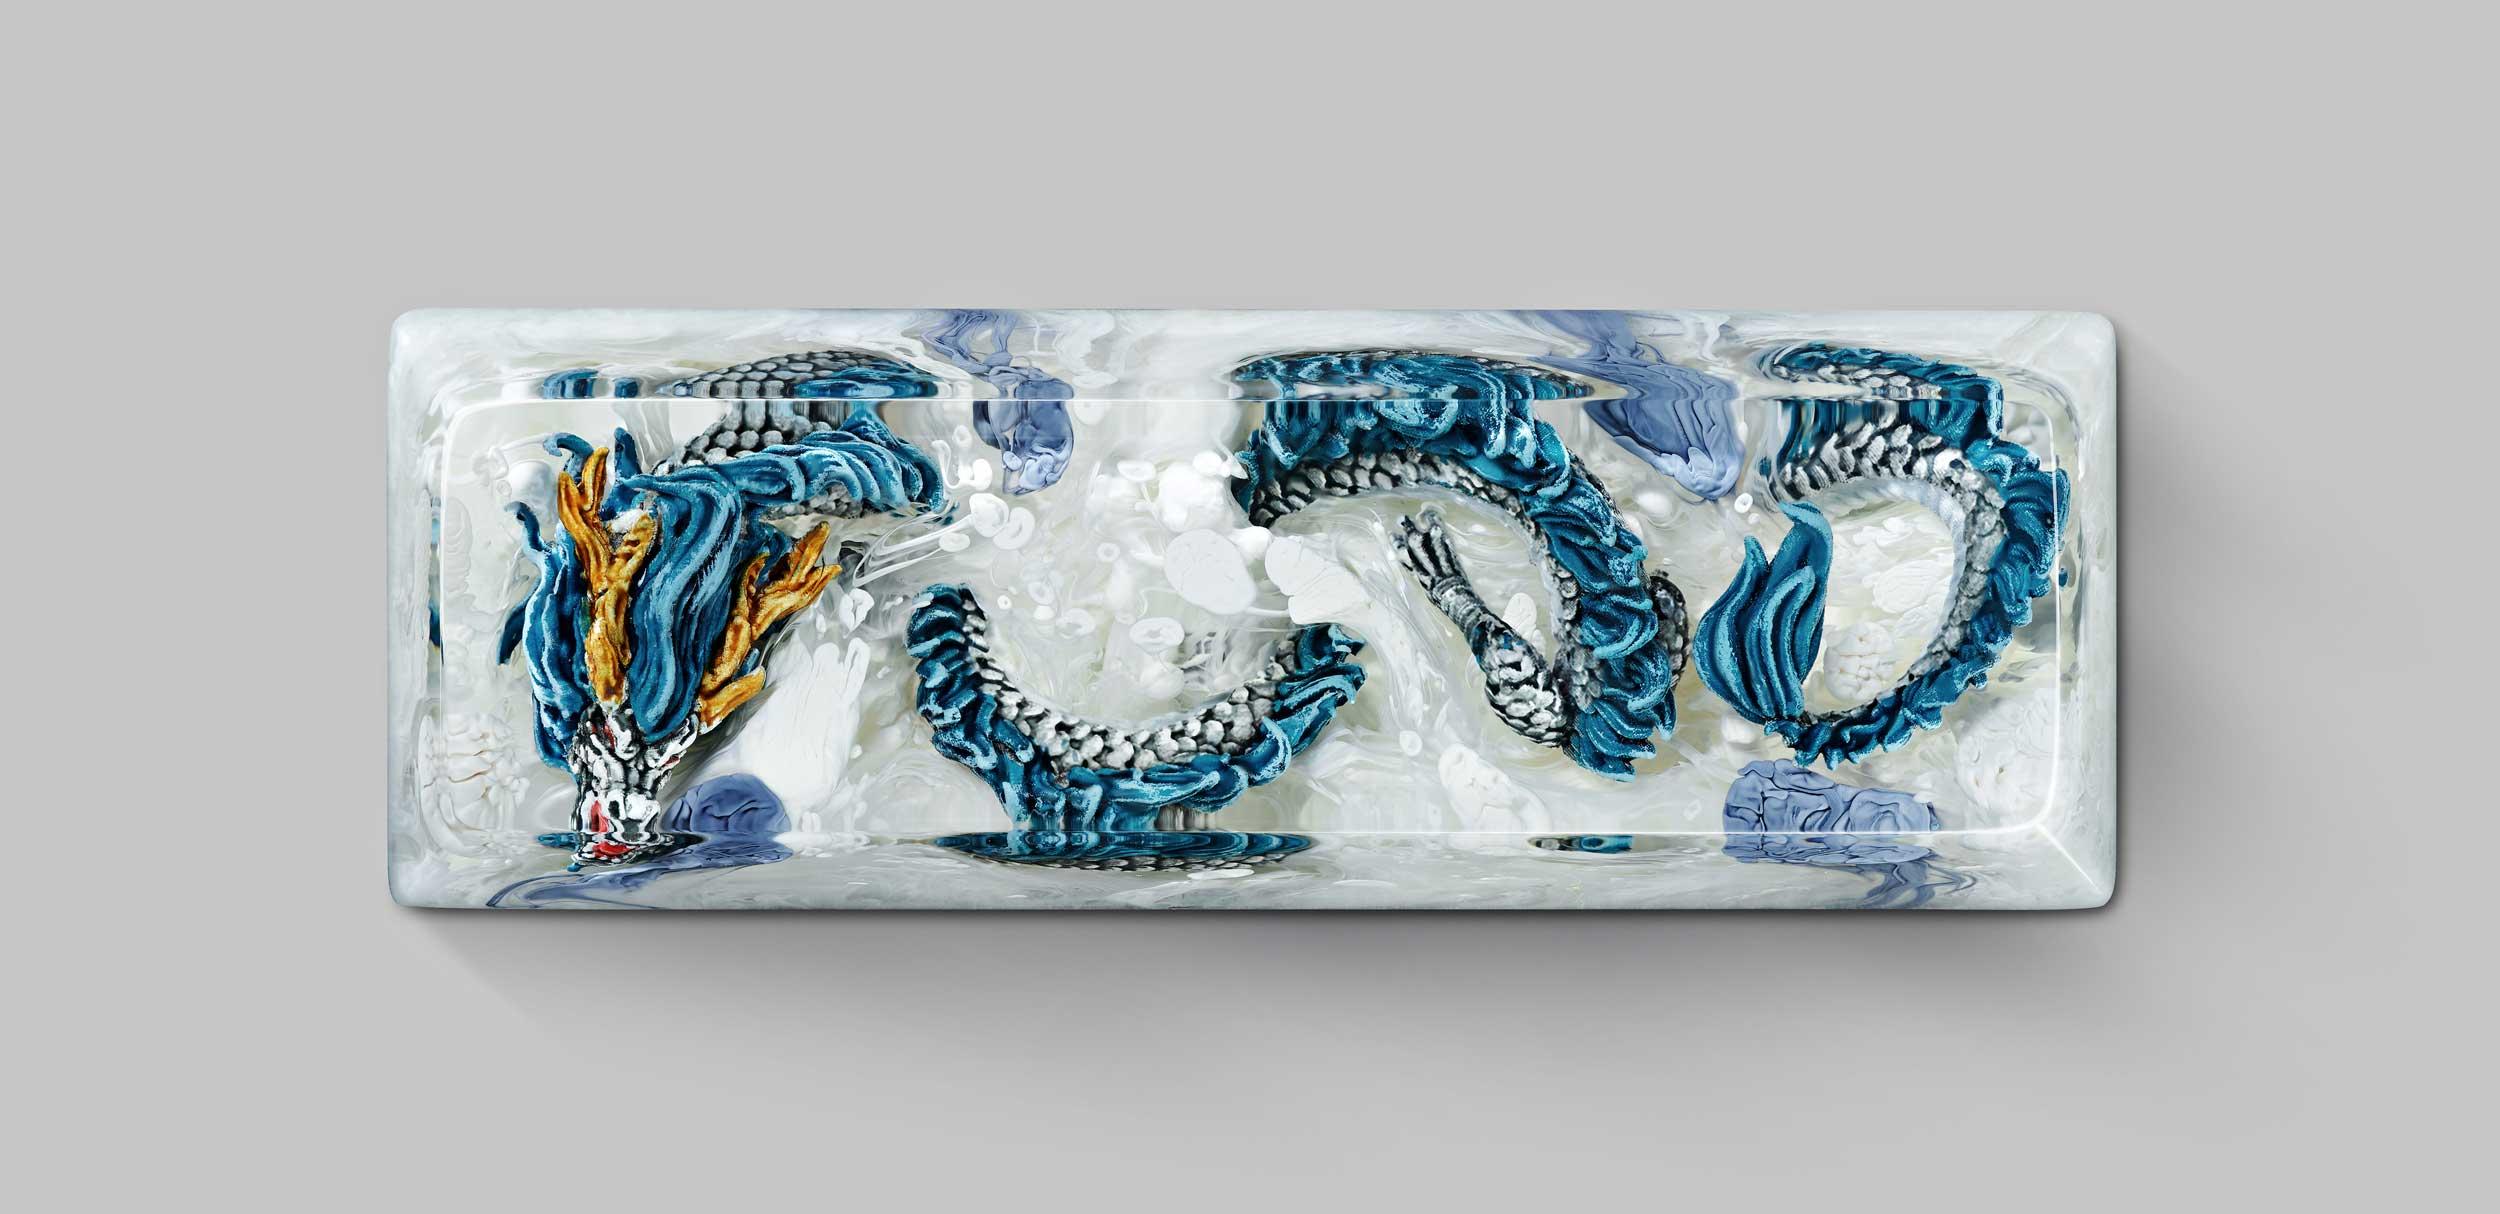 dragon keycaps